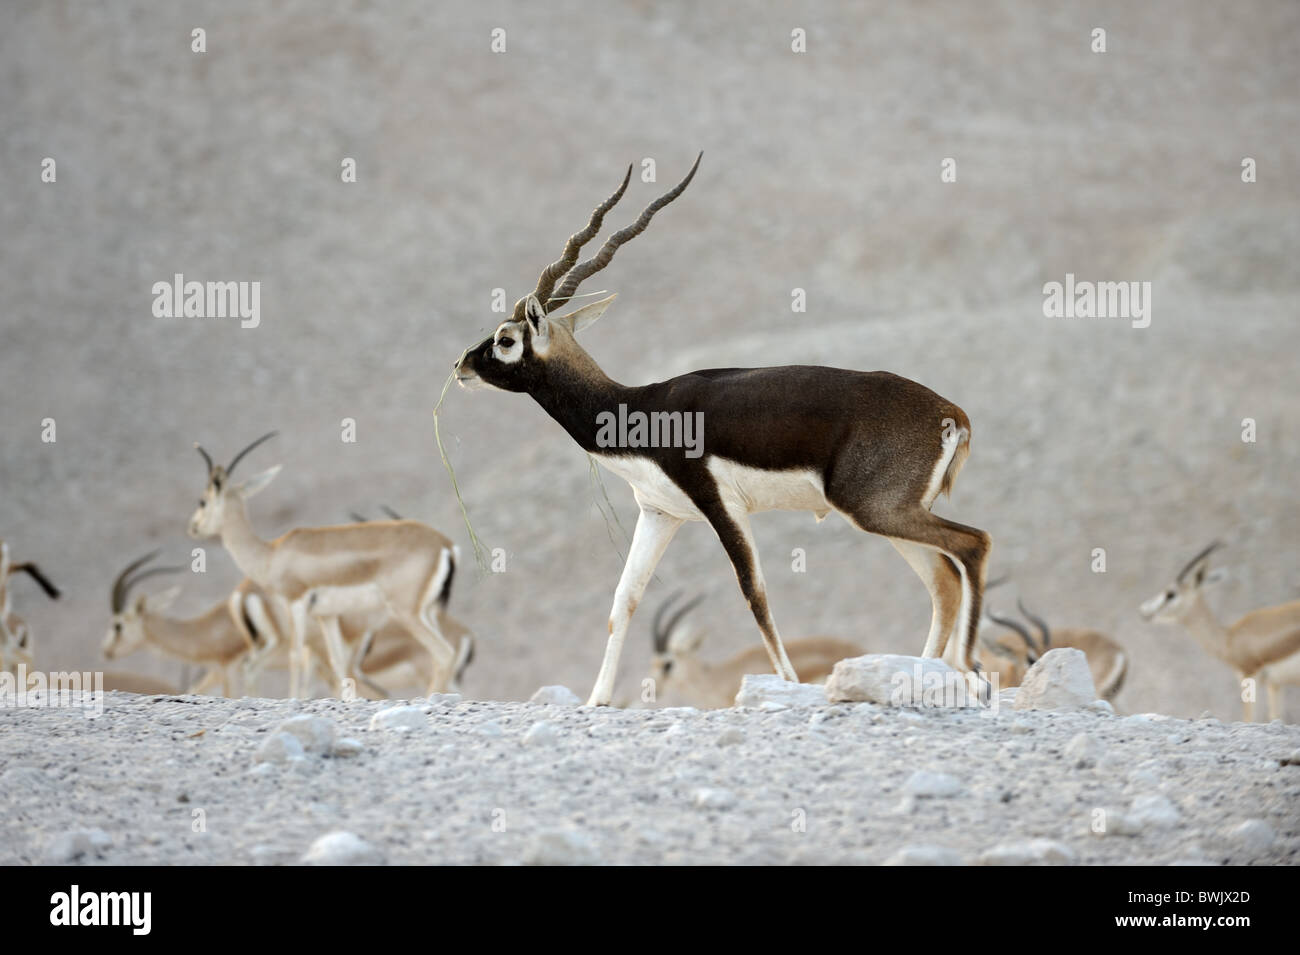 Breeding male blackbuck (Antilope cervicapra) on Sir Bani Yas Island Wildlife Reserve, Abu Dhabi Stock Photo